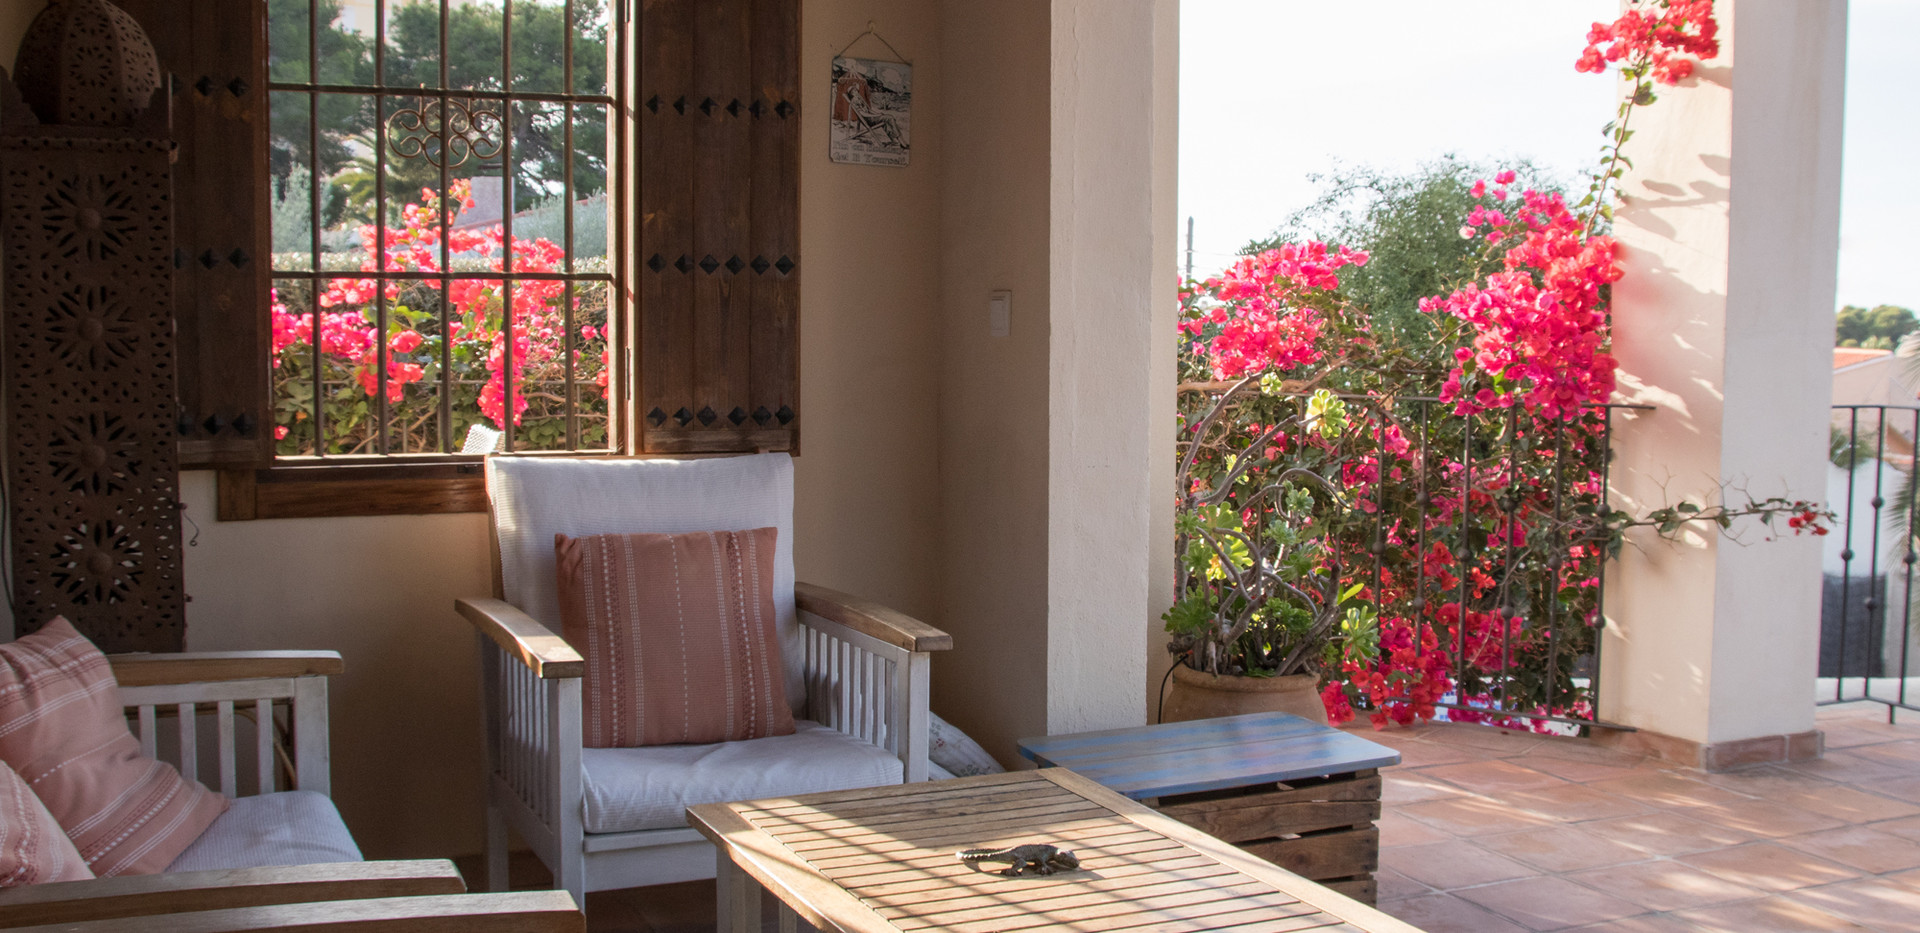 bourgainvillea on the terrace web.jpg